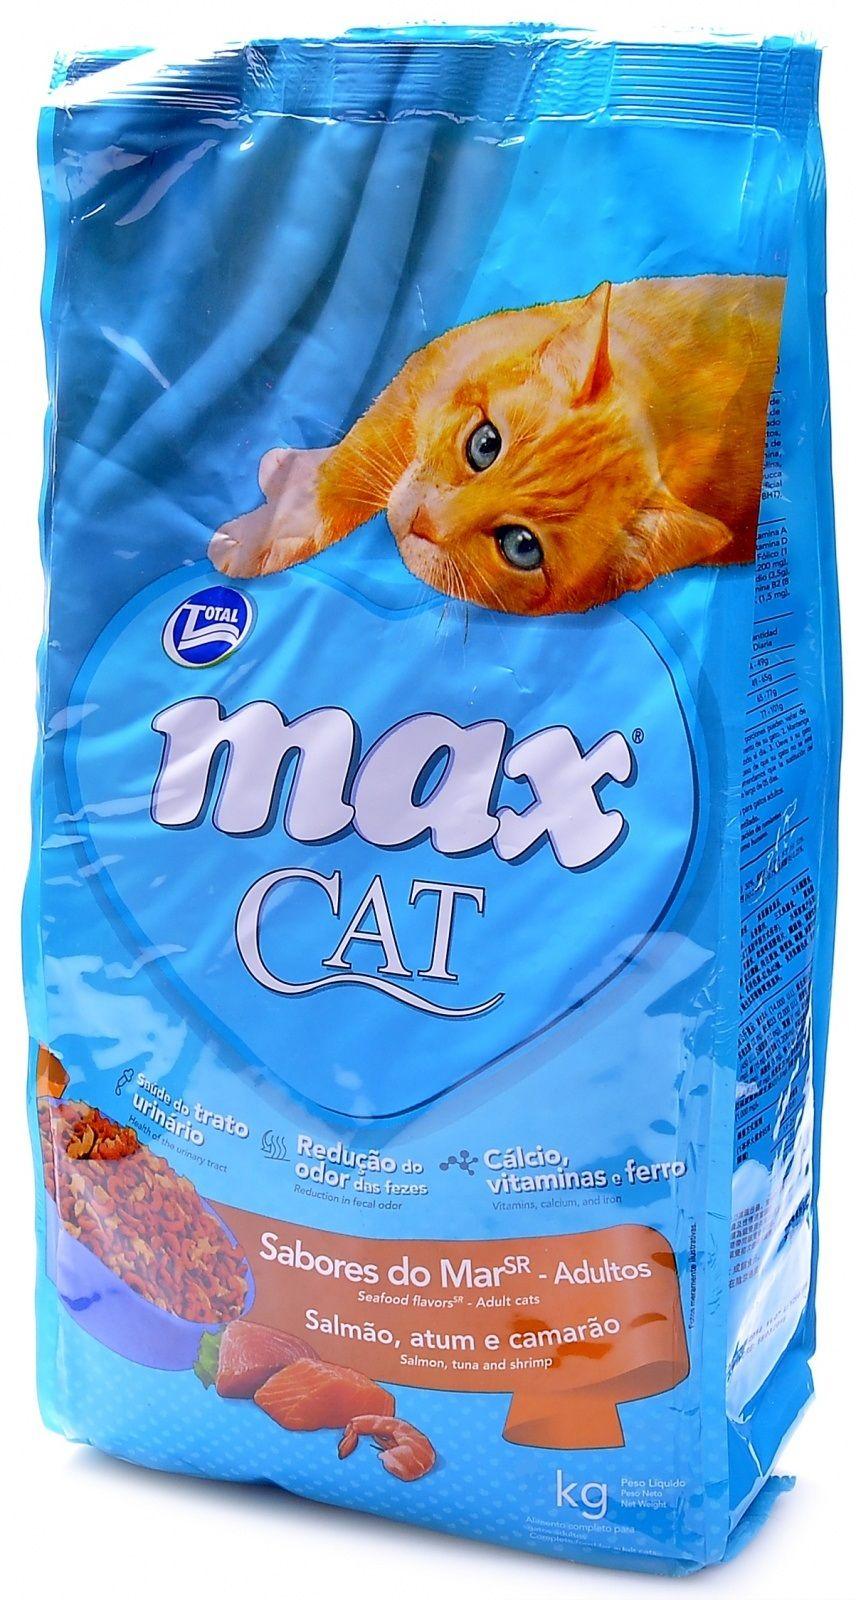 Корм Total Max для кошек с морепродуктами (Max Cat Sea Food Flavors SR), 20кгПовседневные корма<br><br><br>Артикул: 24569<br>Бренд: Total Max<br>Вид: Сухие<br>Вес брутто (кг): 20<br>Страна-изготовитель: Бразилия<br>Вес упаковки (кг): 20<br>Ингредиенты: Кура<br>Для кого: Кошки